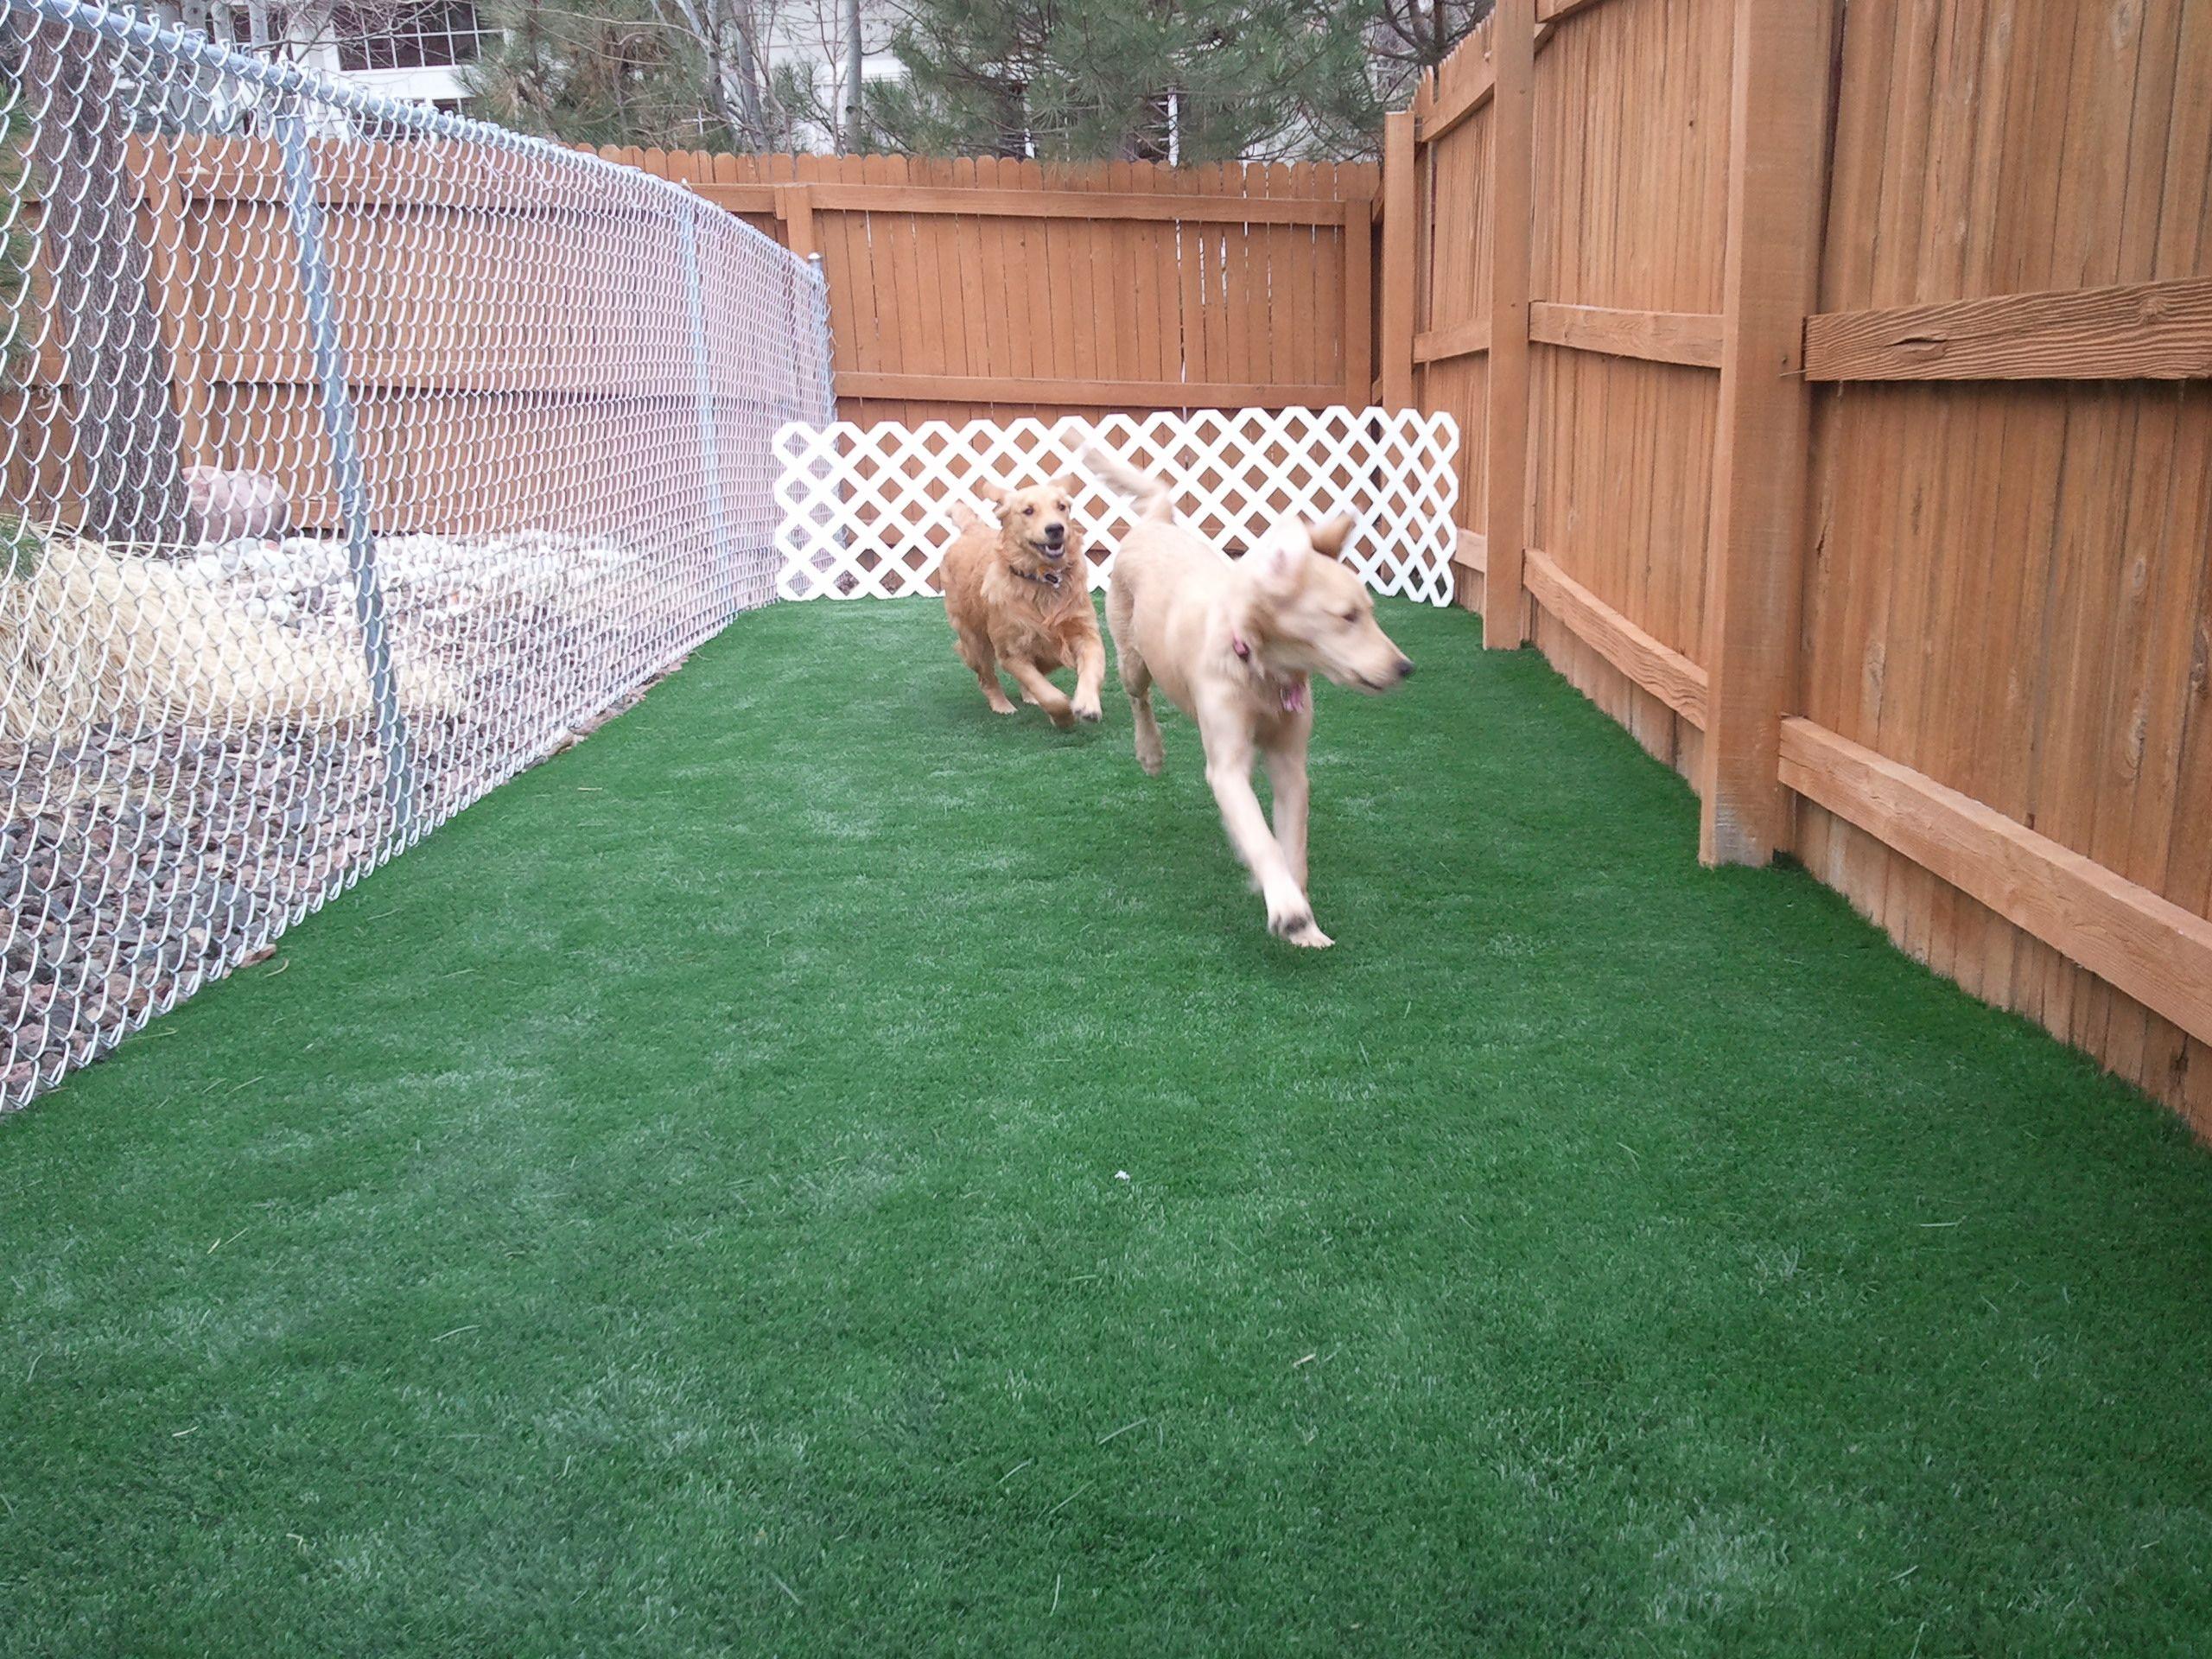 Turf Backyard Dogs :  backyard coming funny dogs dog runs dog run backyard astroturf dog dog